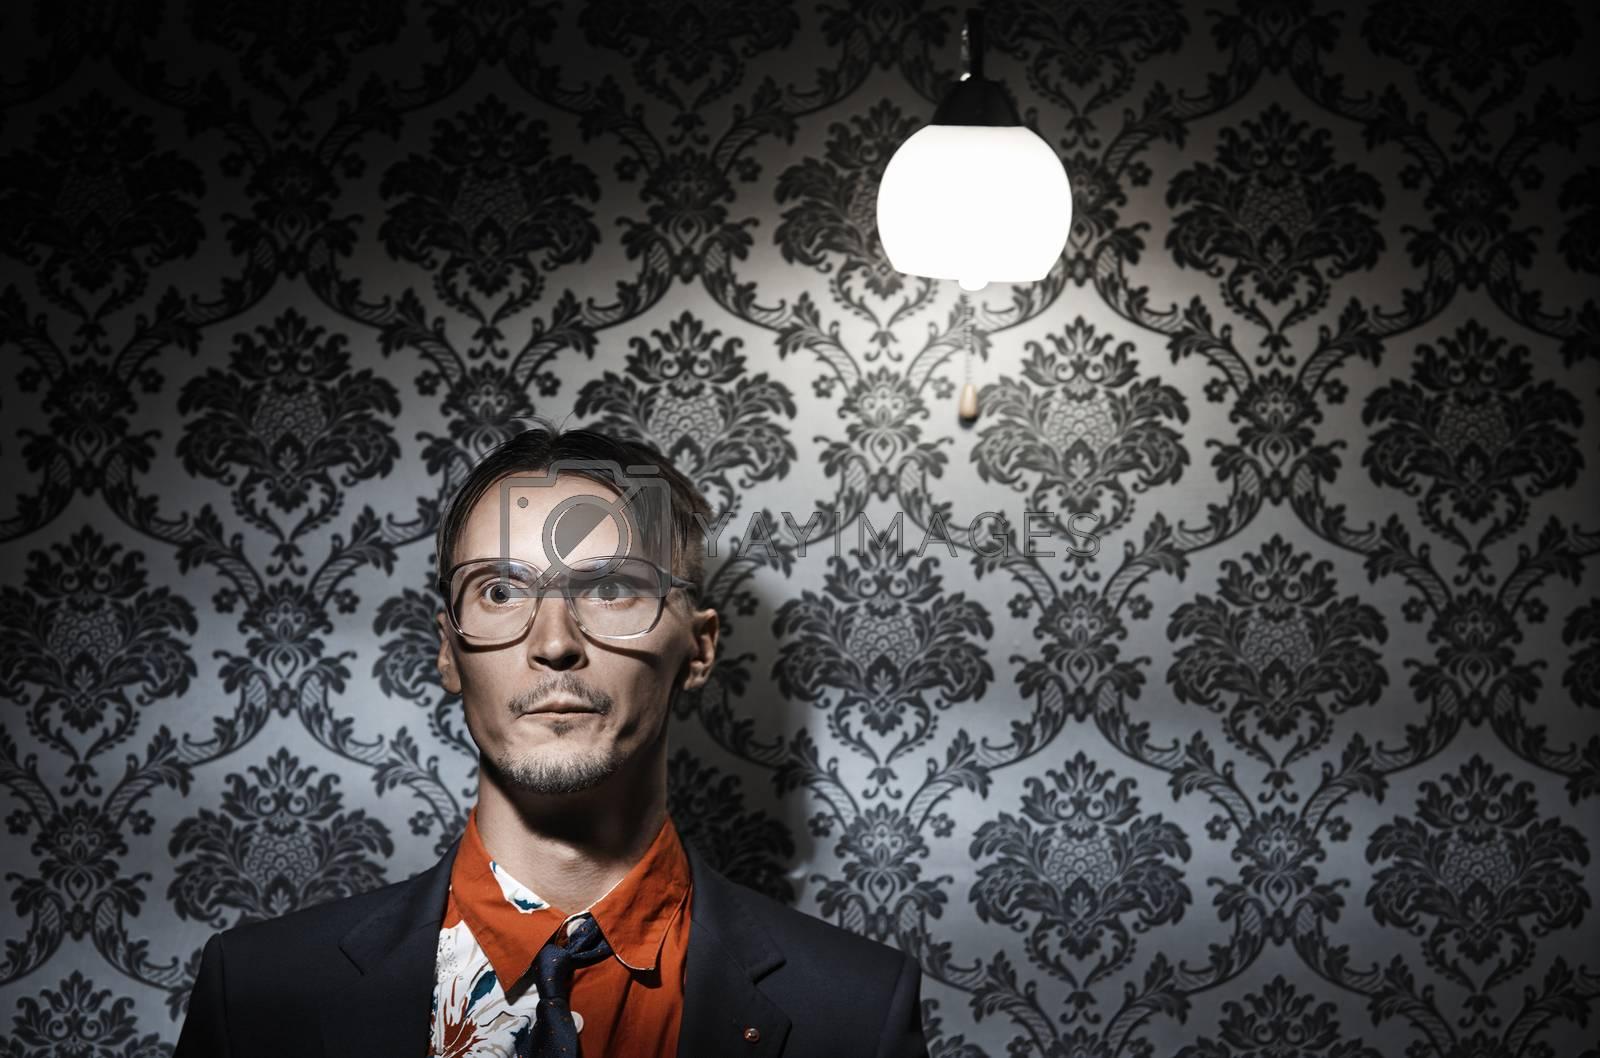 Crazy maniac man at the dark wall . Horizontal photo